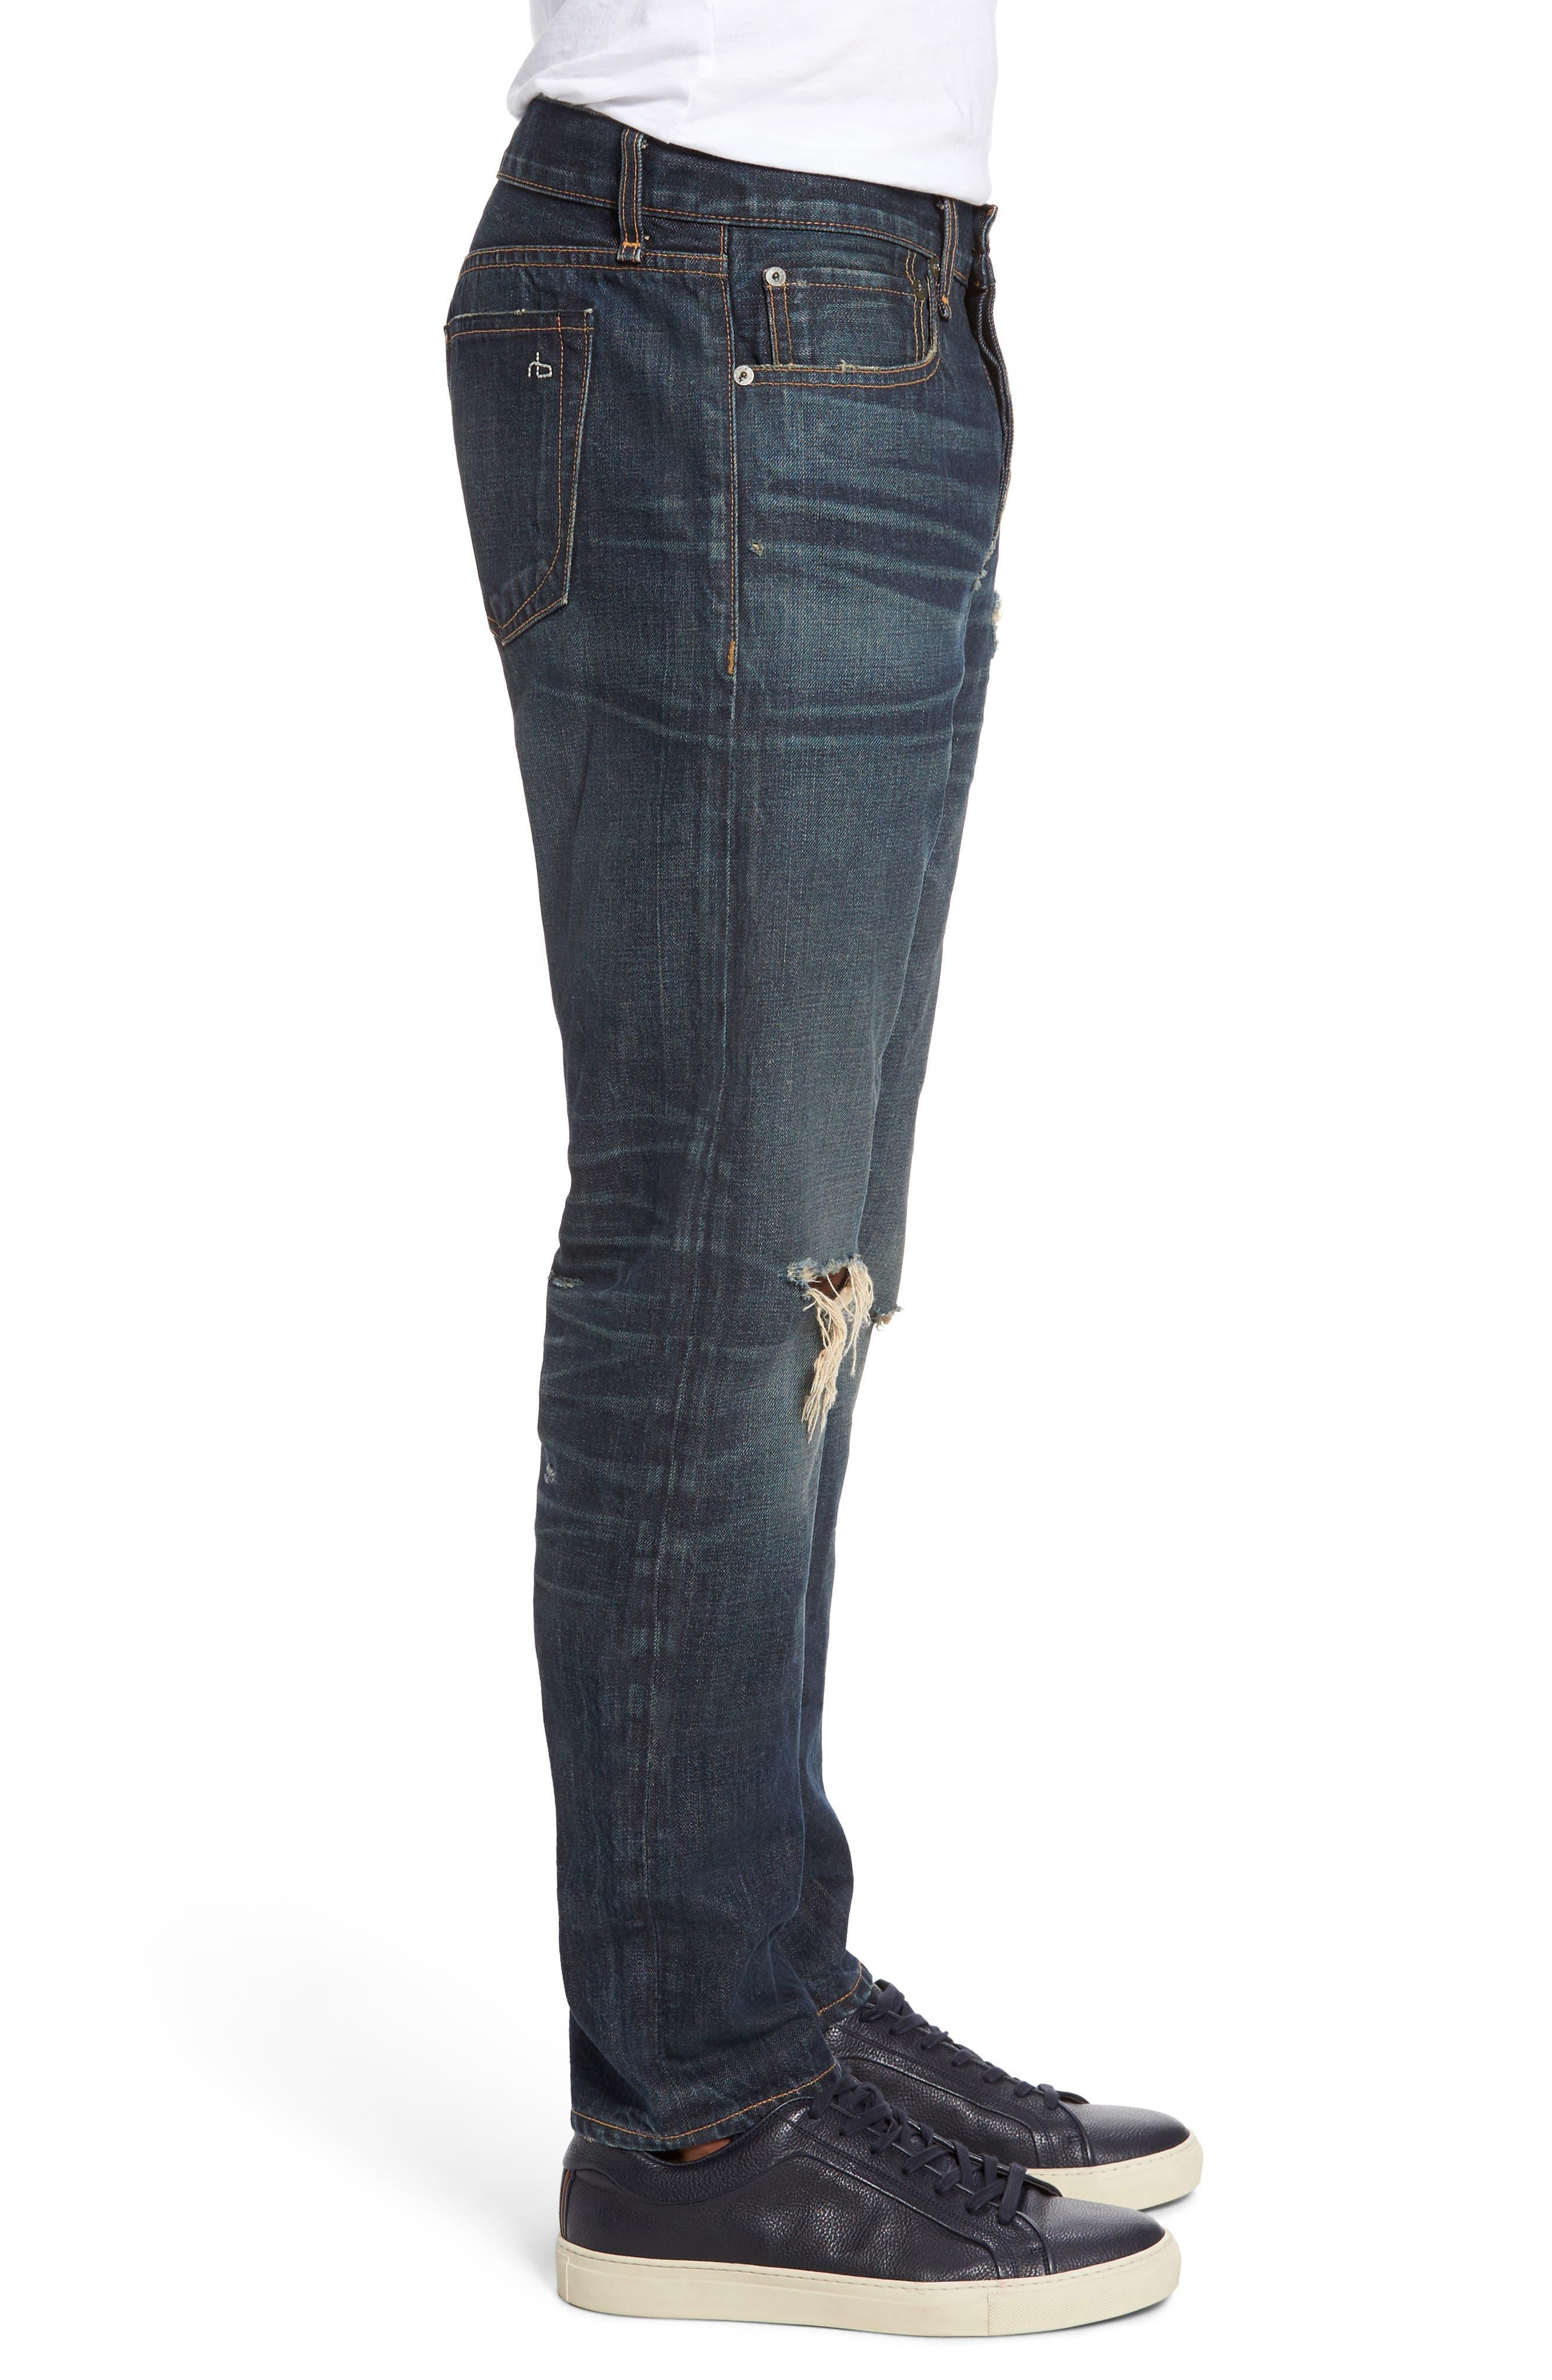 Alternate Image 3  - rag & bone Fit 2 Slim Fit Jeans (Zeitgeist)